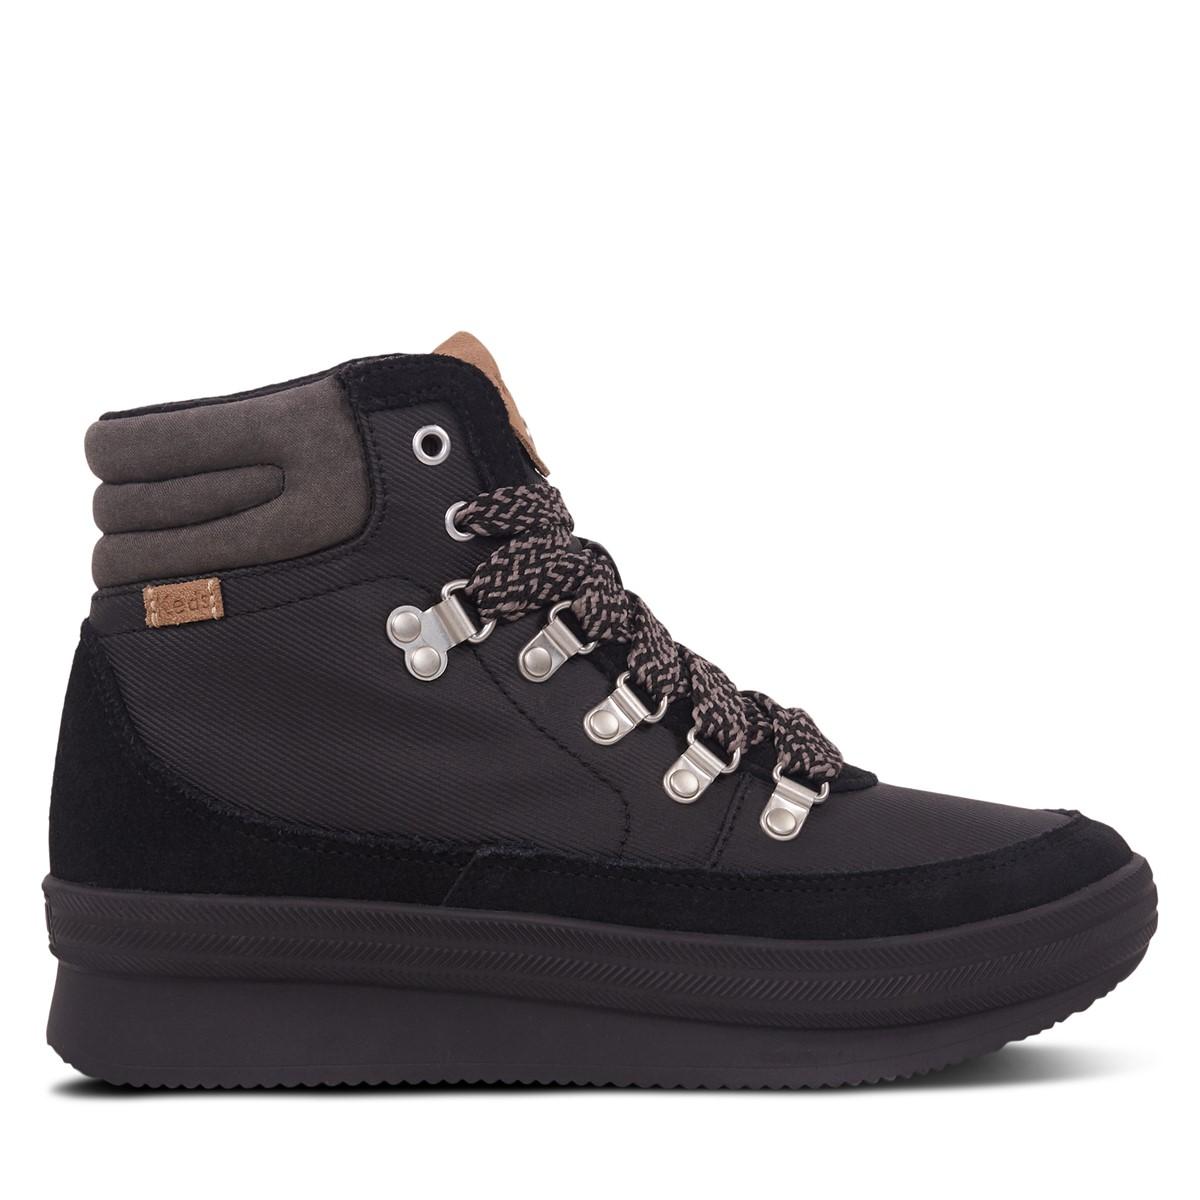 Women's Midland Boots in Black